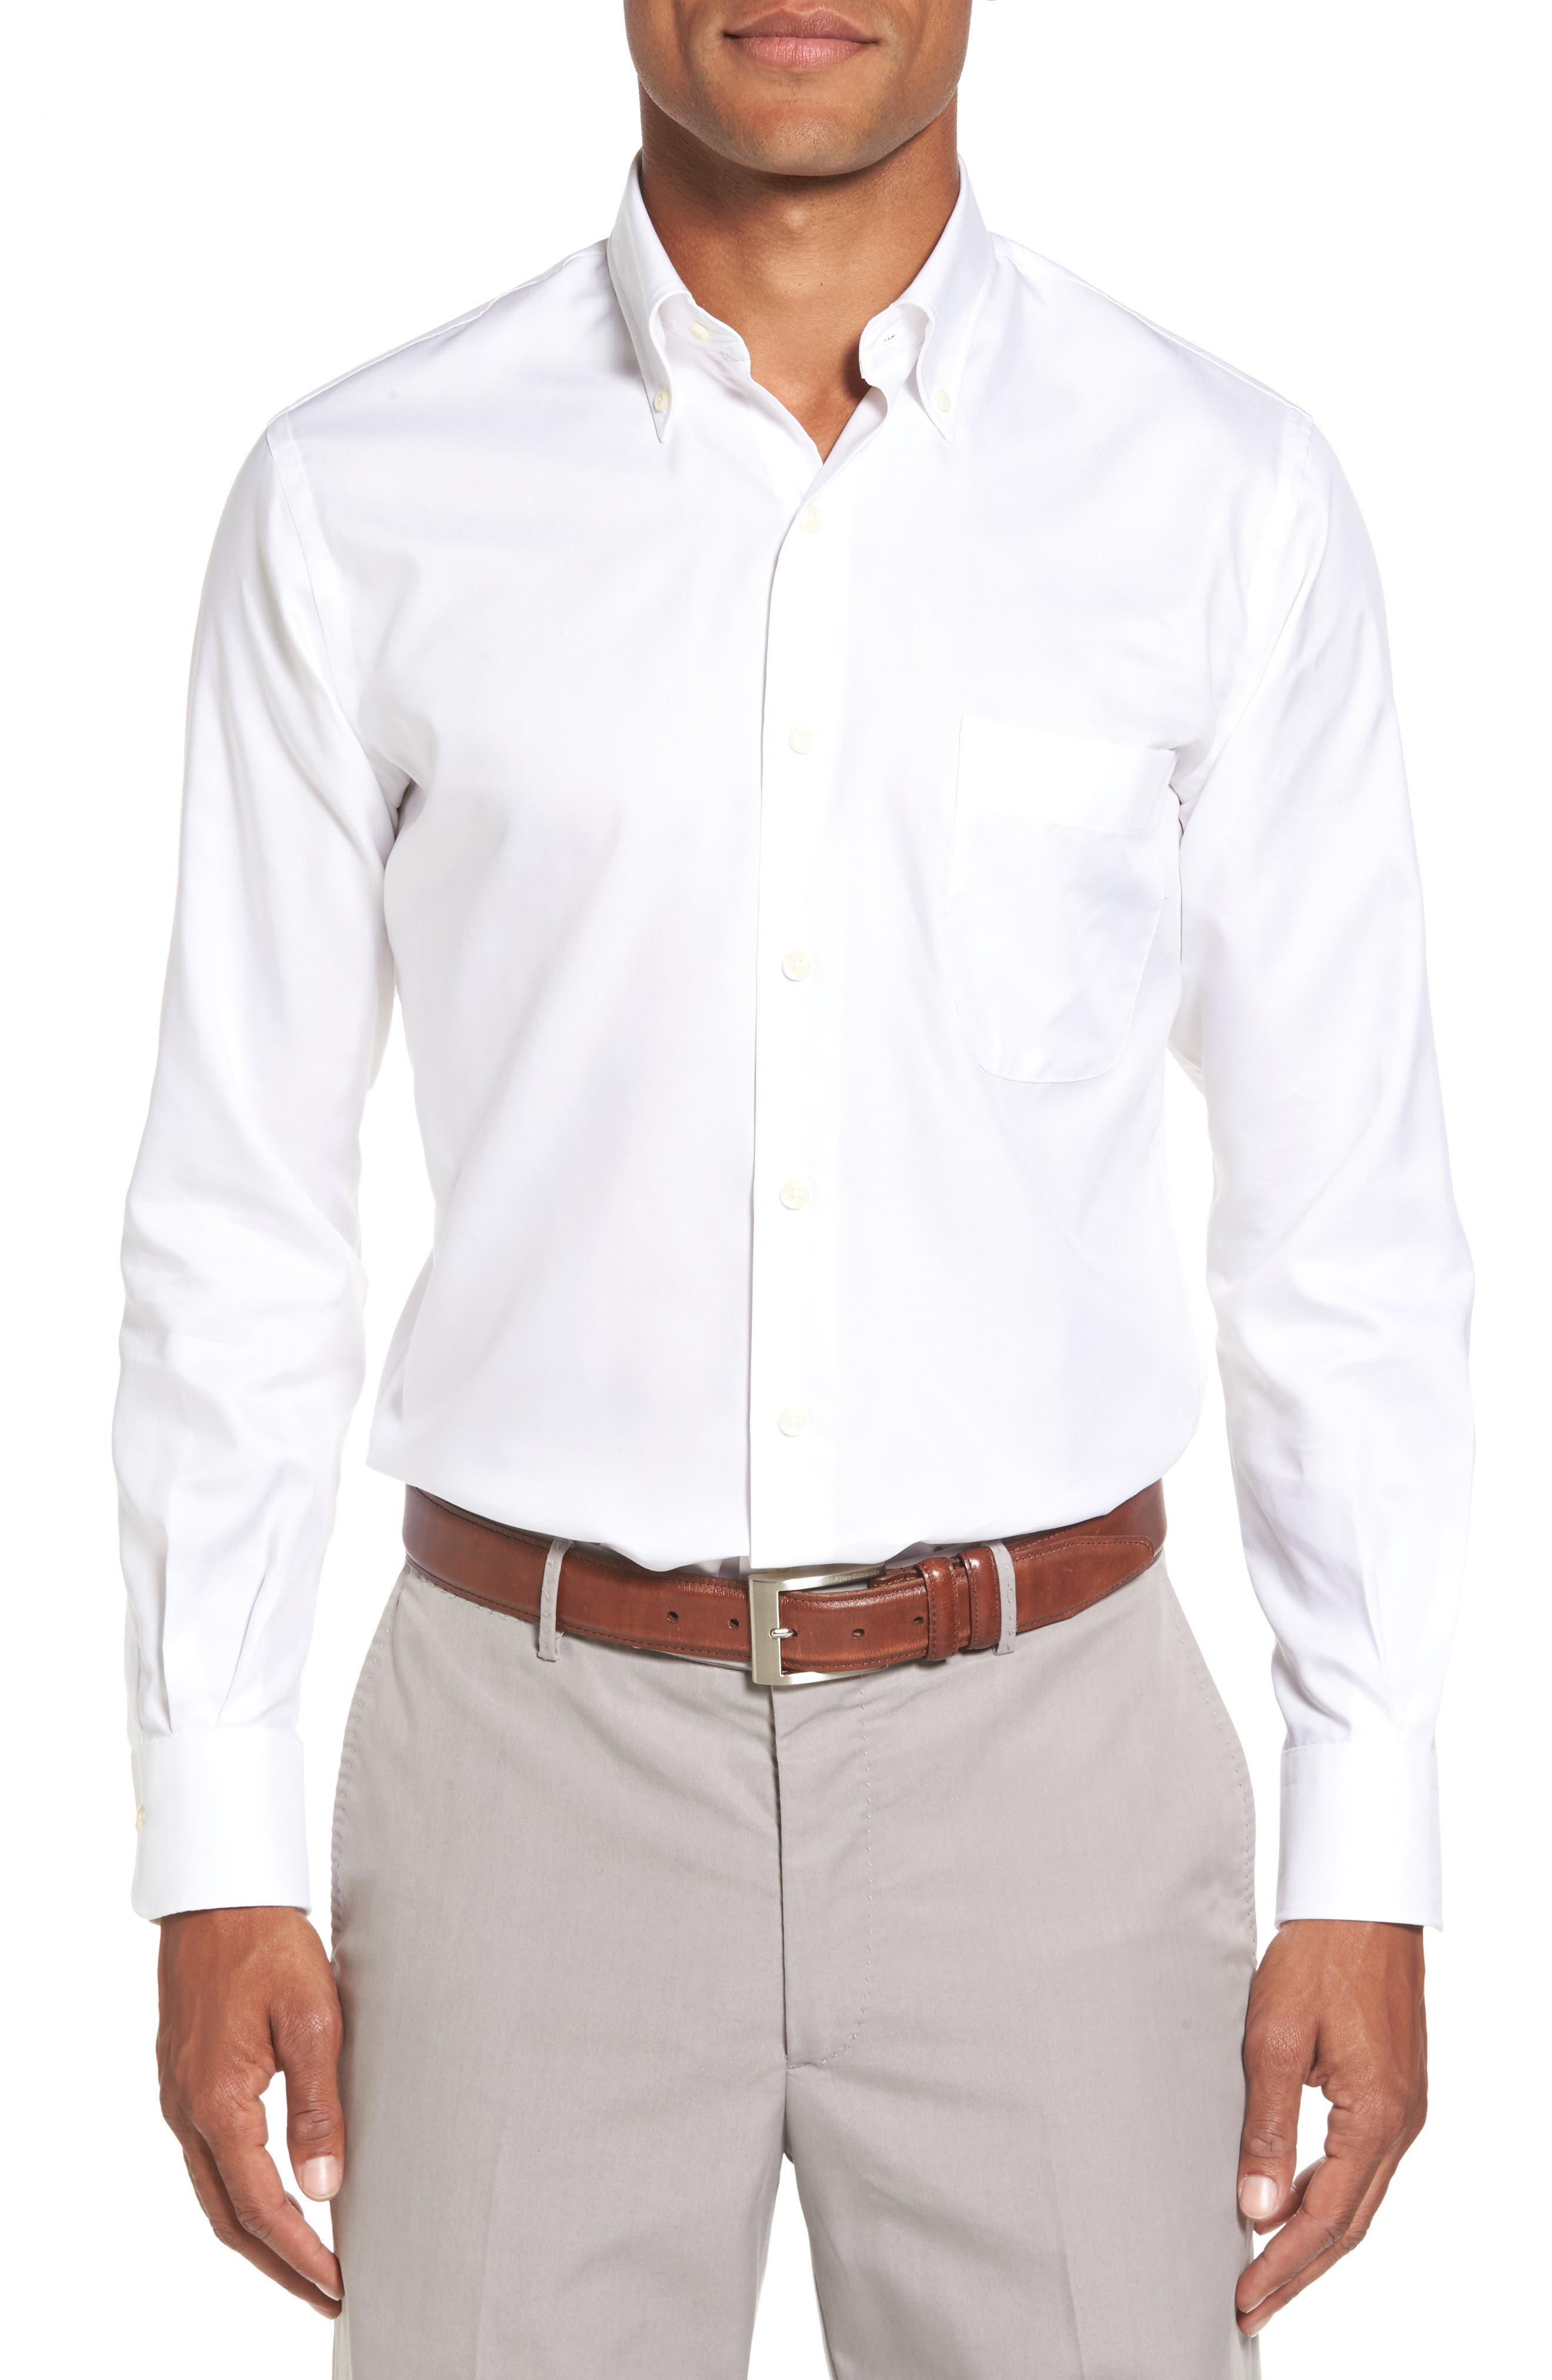 PETER MILLAR, Crown Soft Pinpoint Regular Fit Sport Shirt, Main thumbnail 1, color, WHITE